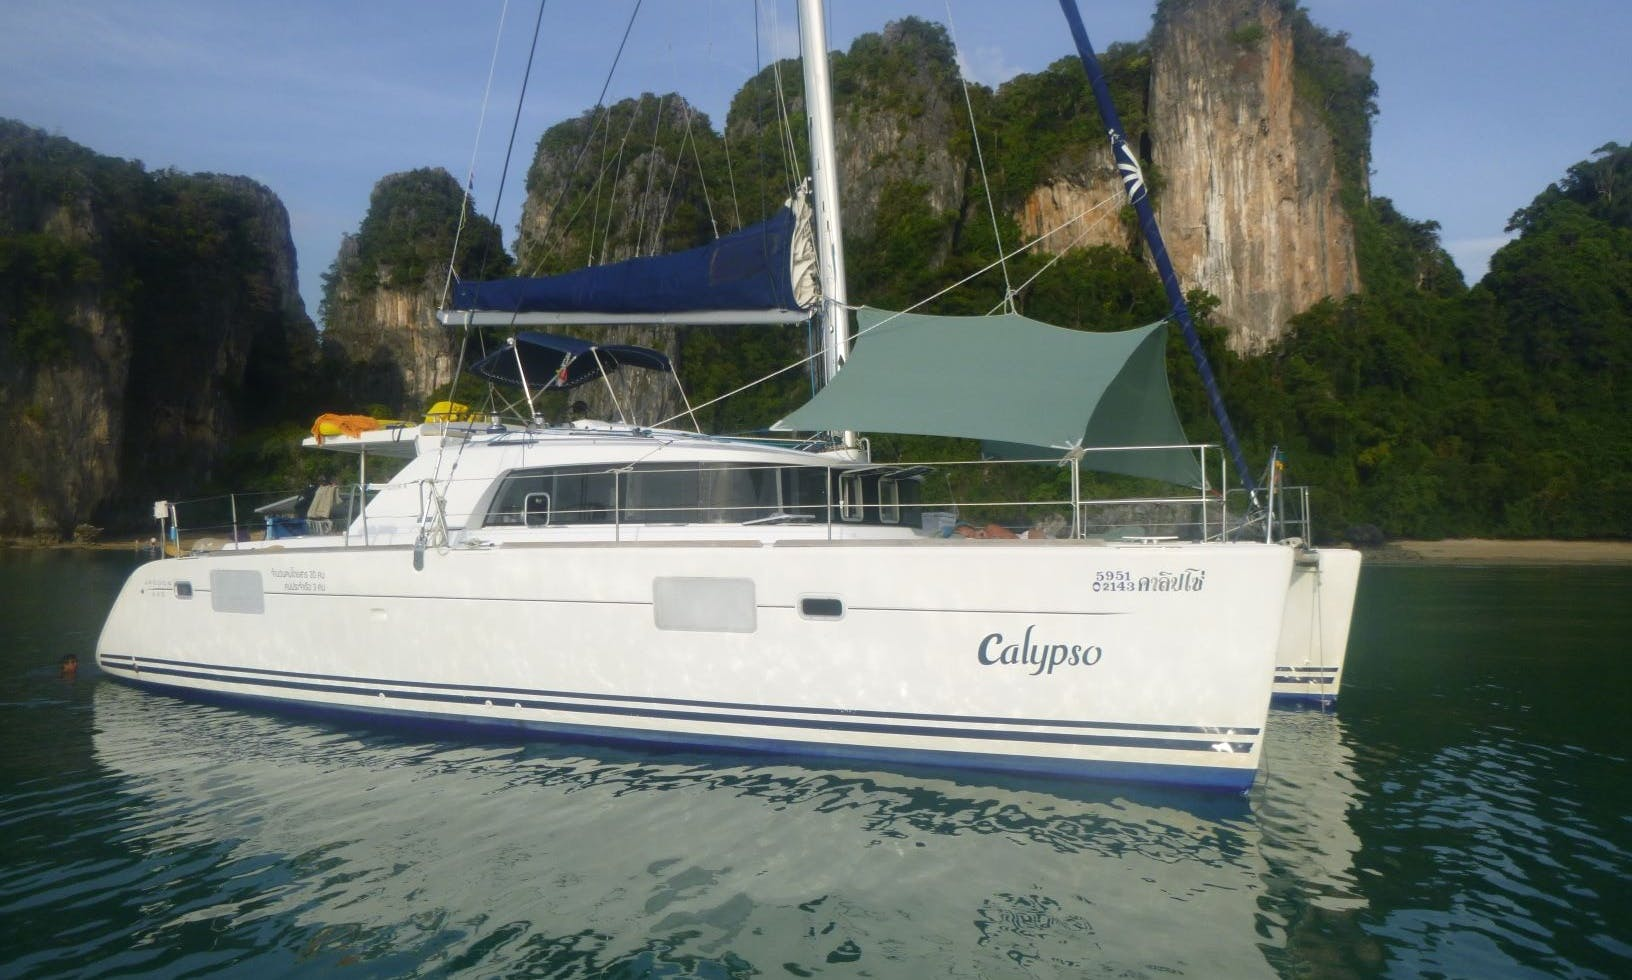 Lagoon 440 Cruising Catamaran Charter for Up to 8 People in Phuket, Thailand